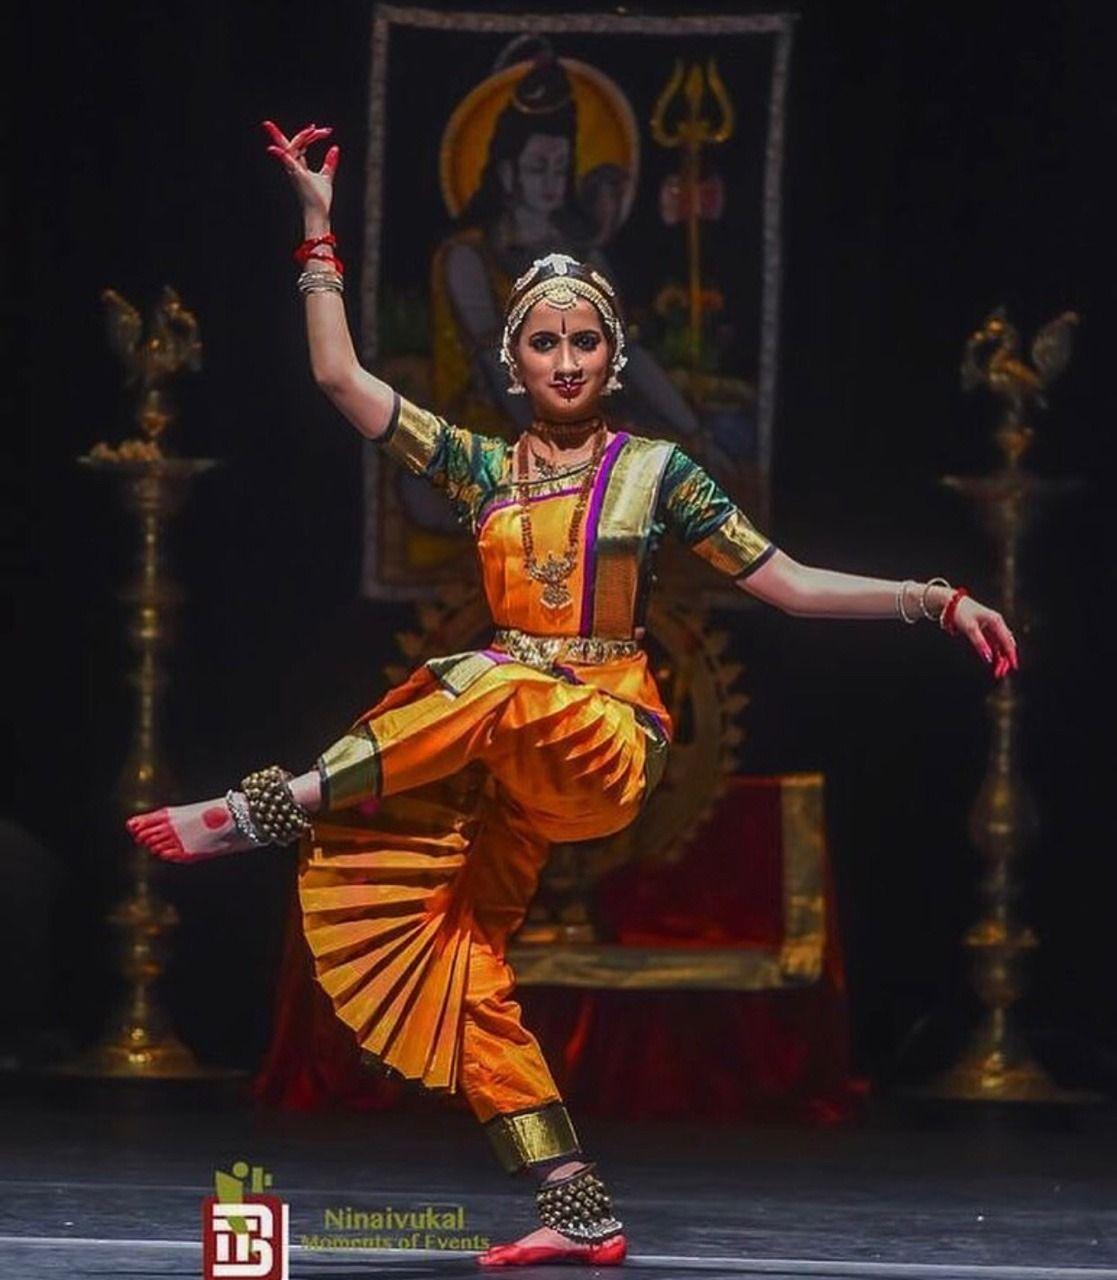 ♪┗ ( ・o・) ┓♪ A Visual Sermon ♪┏(・o・ )┛♪ | Bharatanatyam dancer, Bharatanatyam  poses, Dance of india